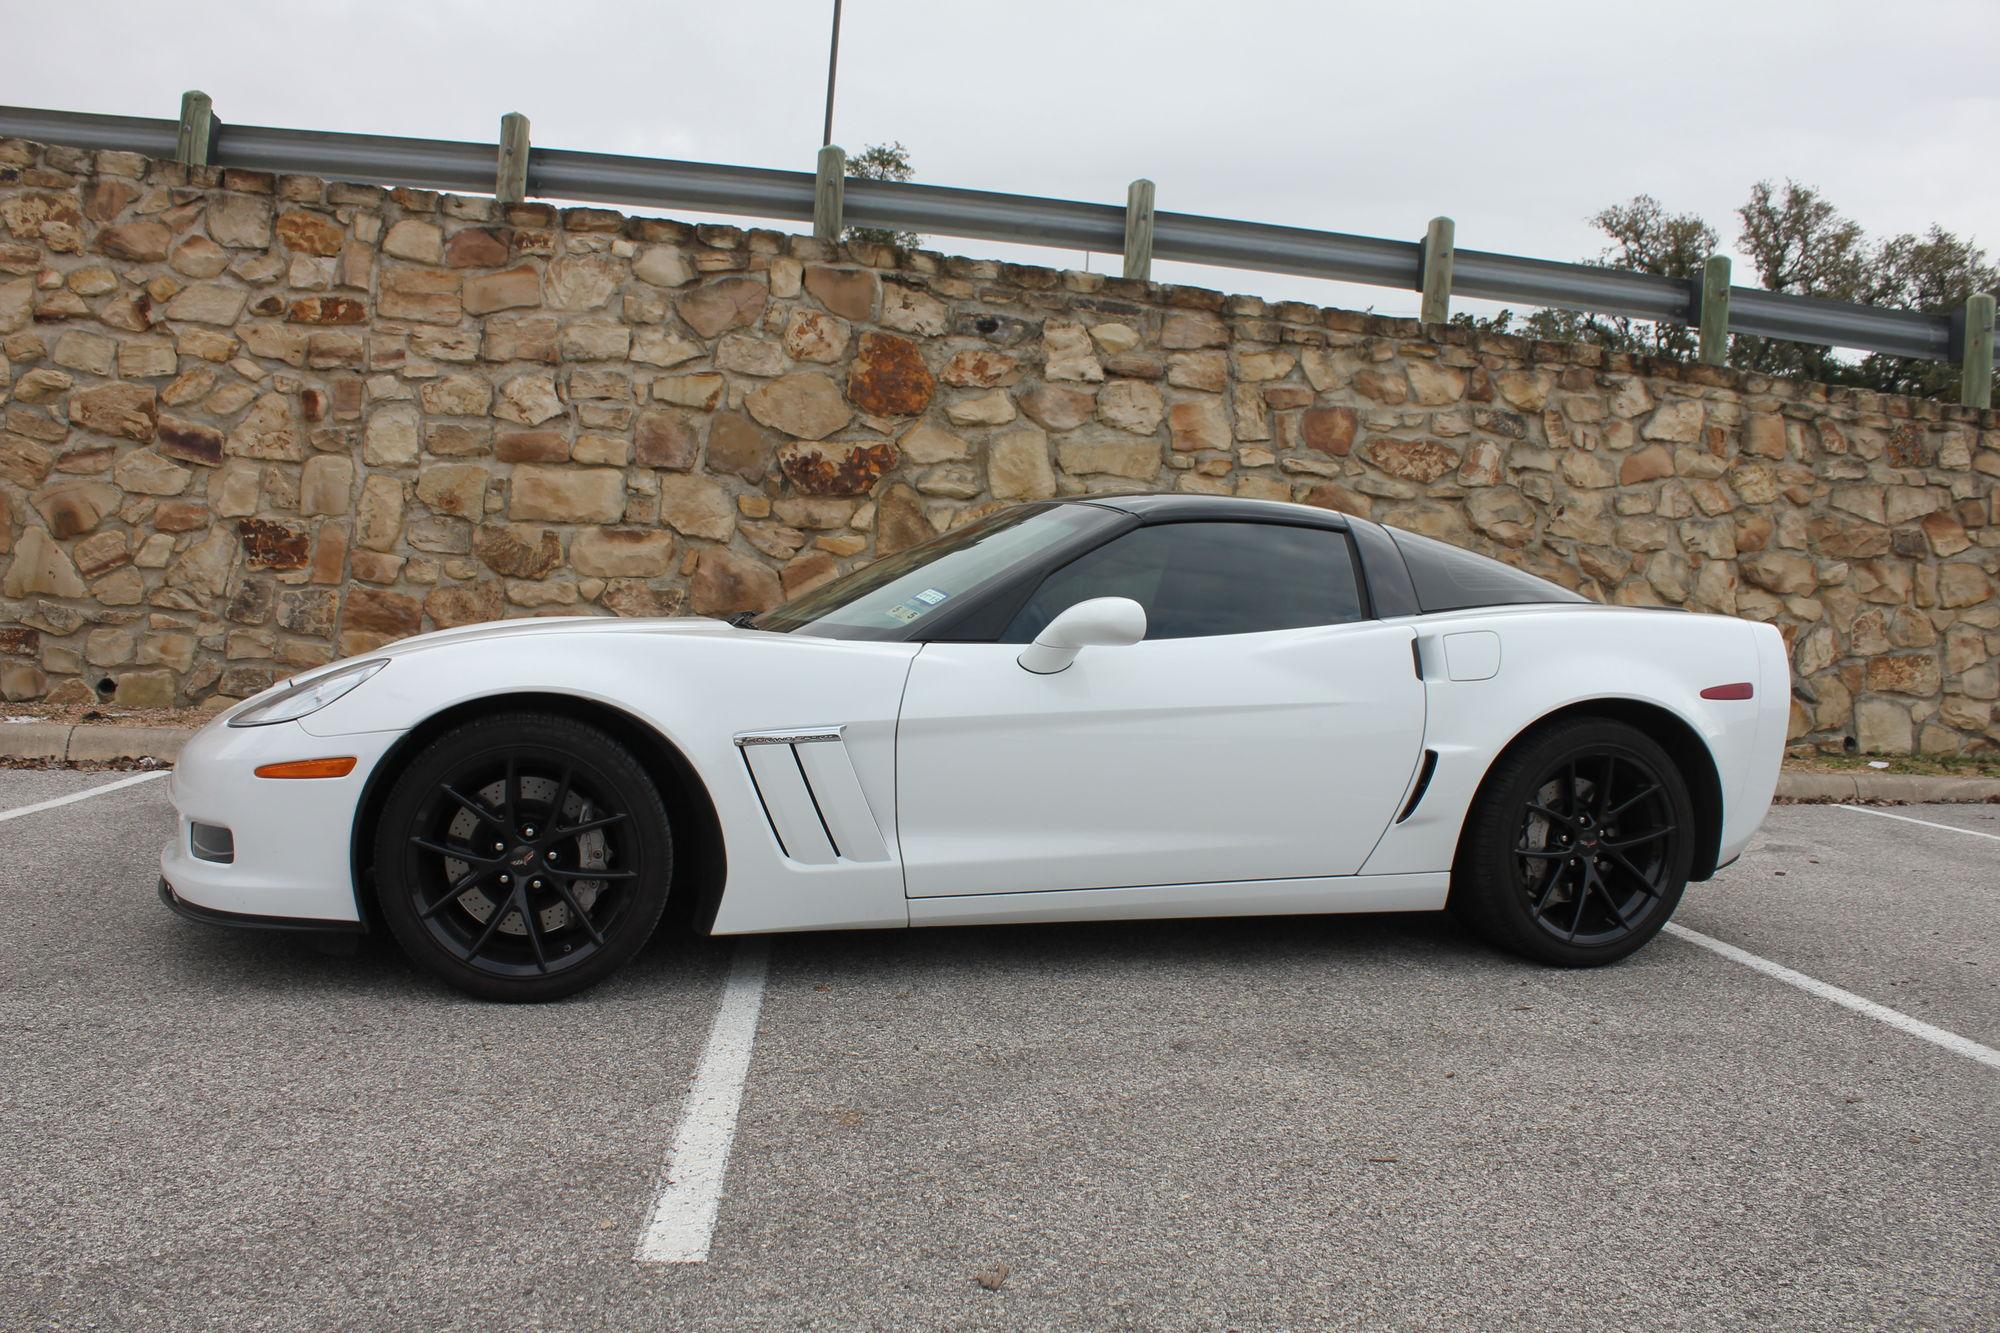 White C6 With Black Wheels Corvetteforum Chevrolet